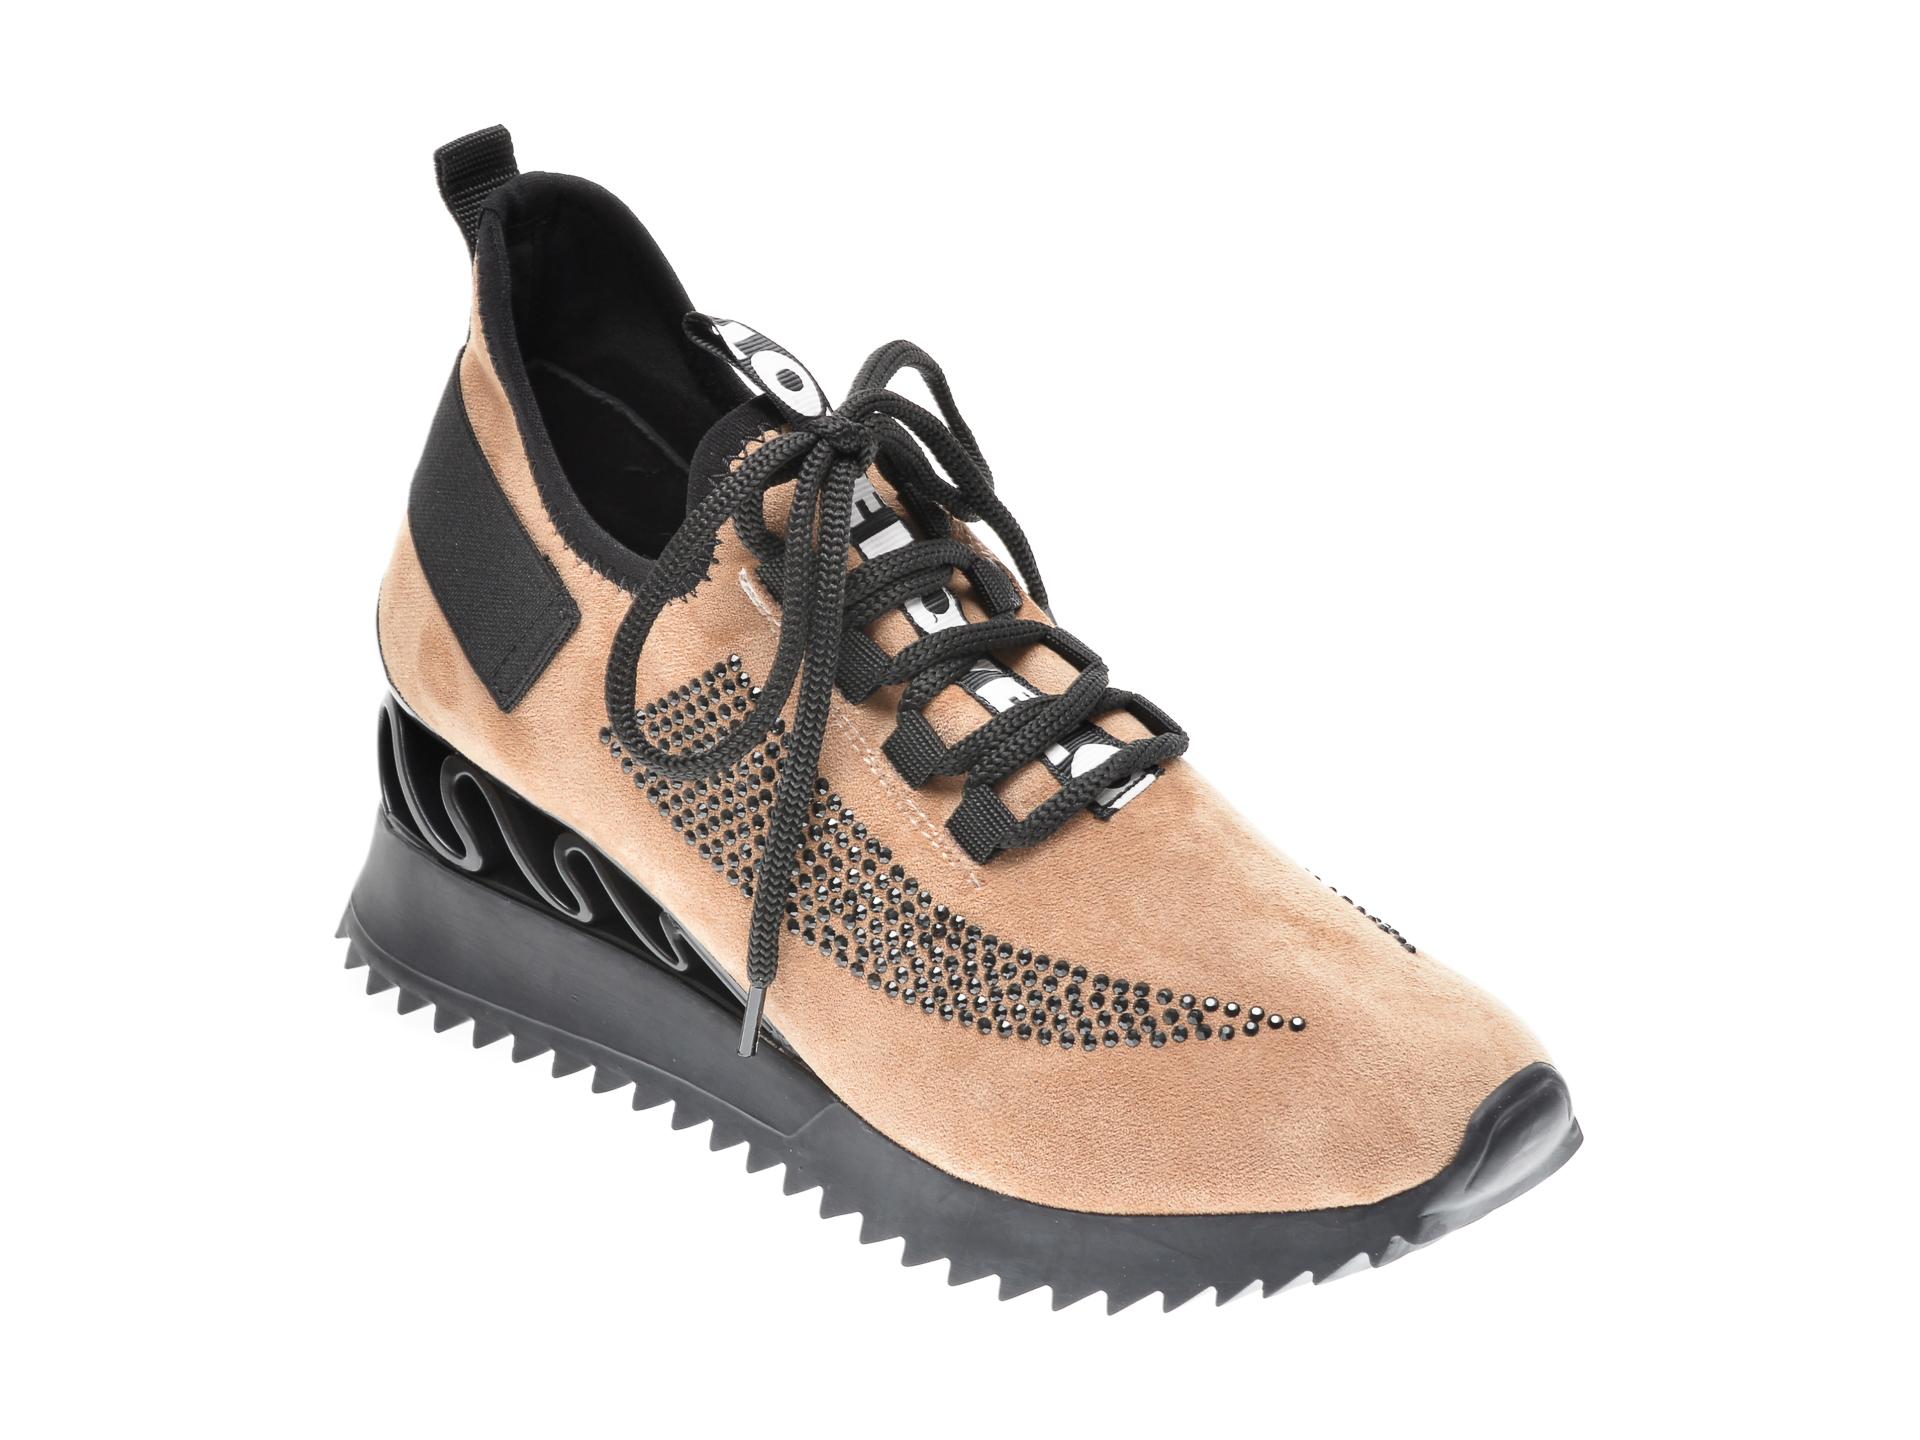 Pantofi sport GRYXX maro, MK8856, din piele ecologica imagine